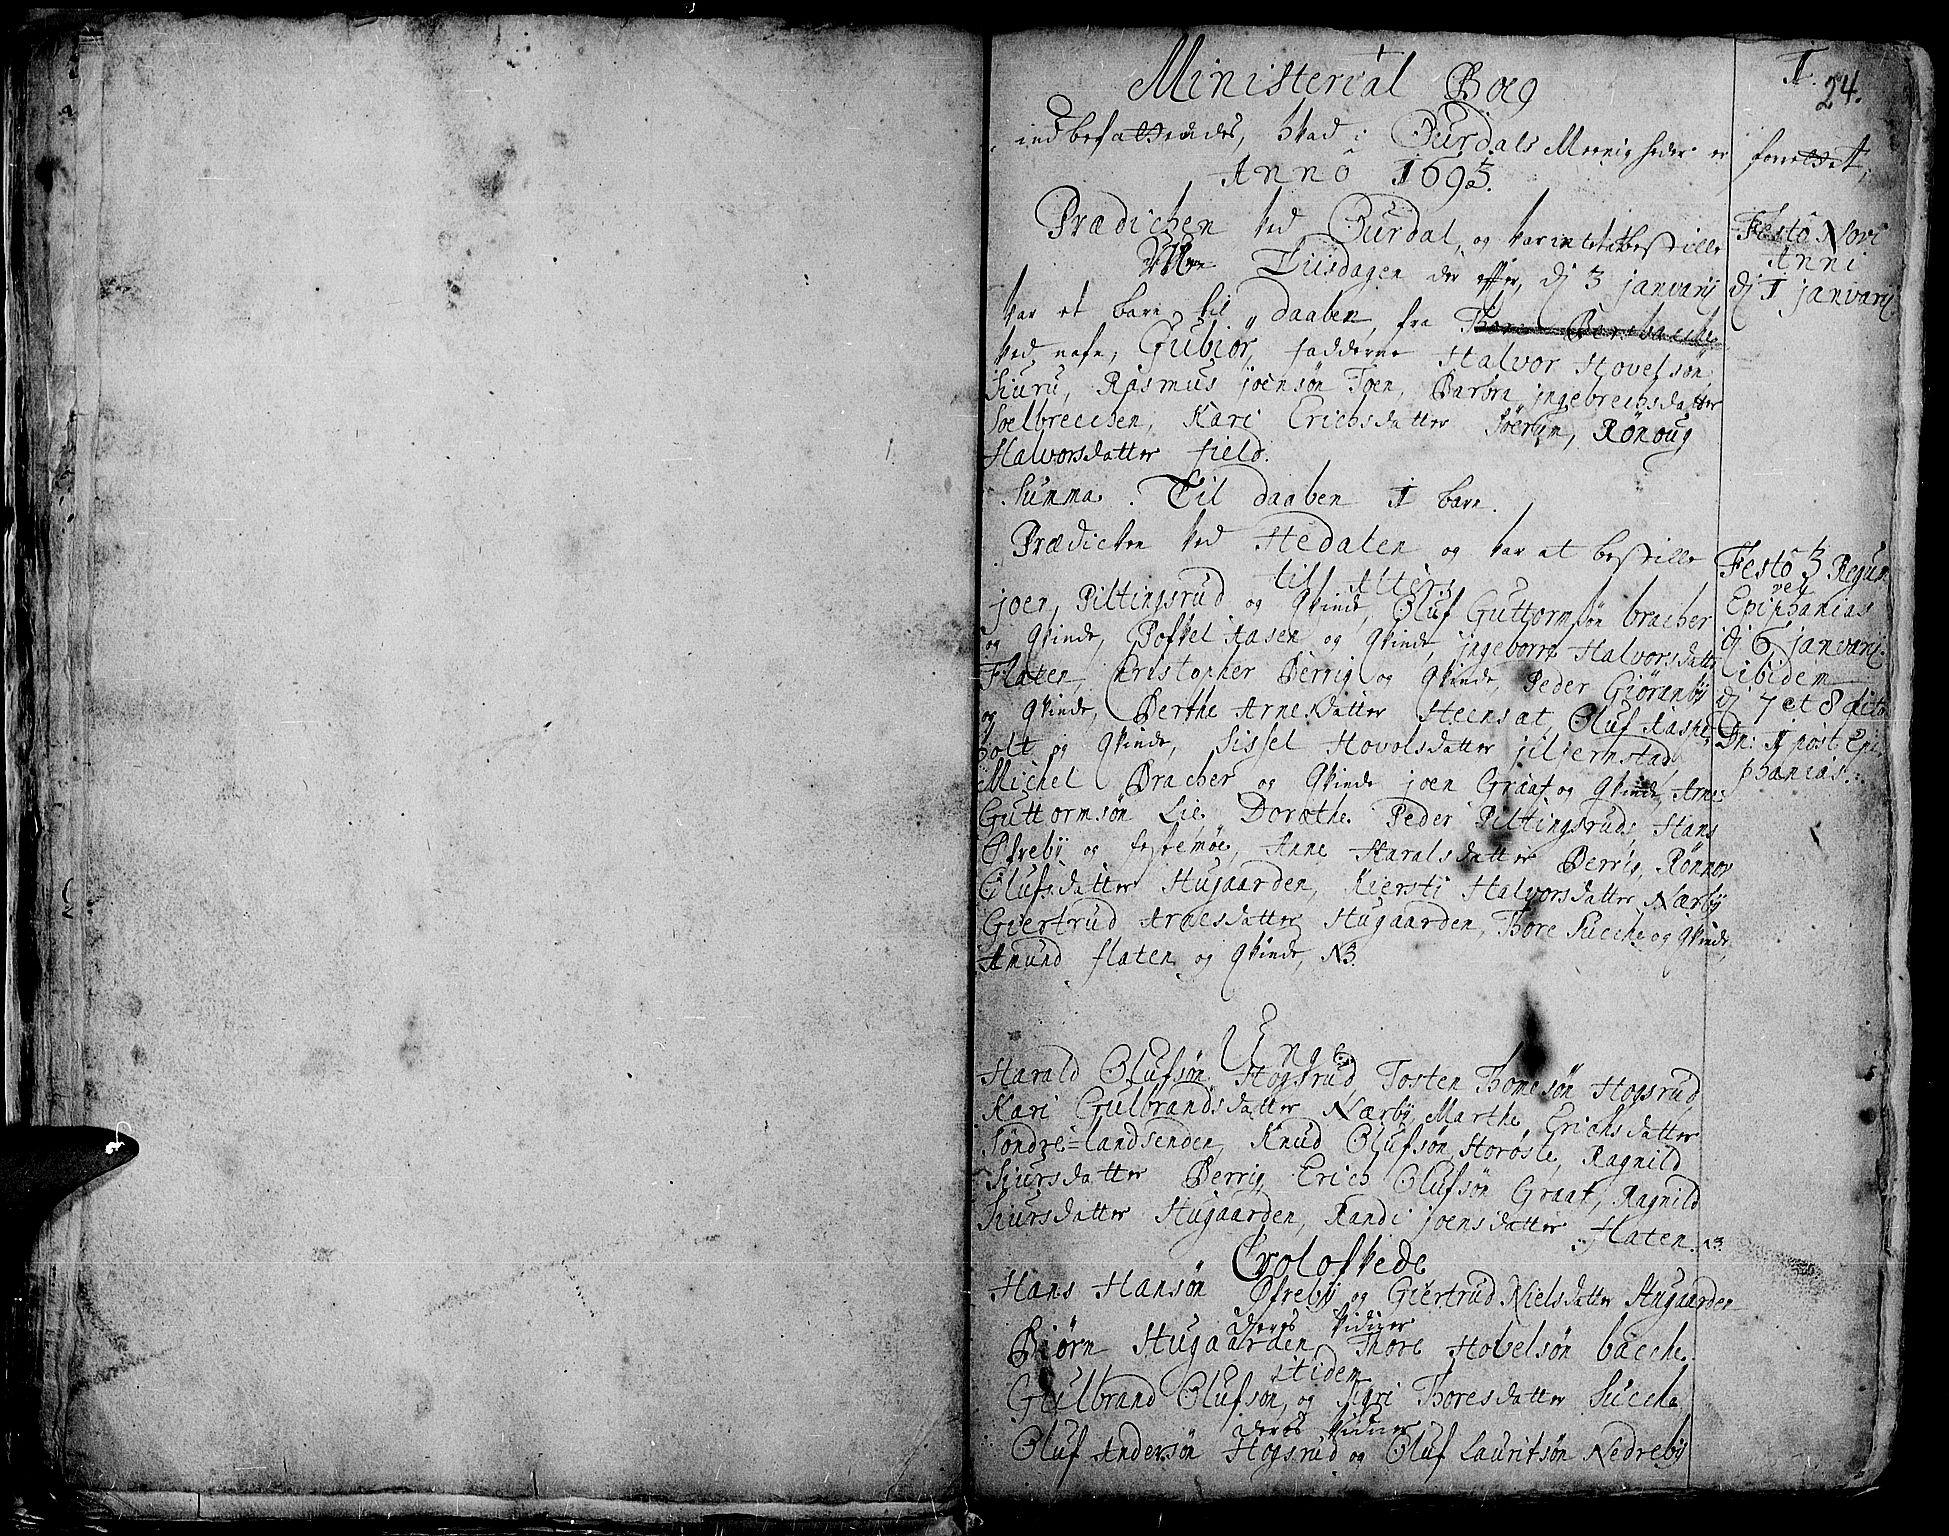 SAH, Aurdal prestekontor, Ministerialbok nr. 1-3, 1692-1730, s. 24